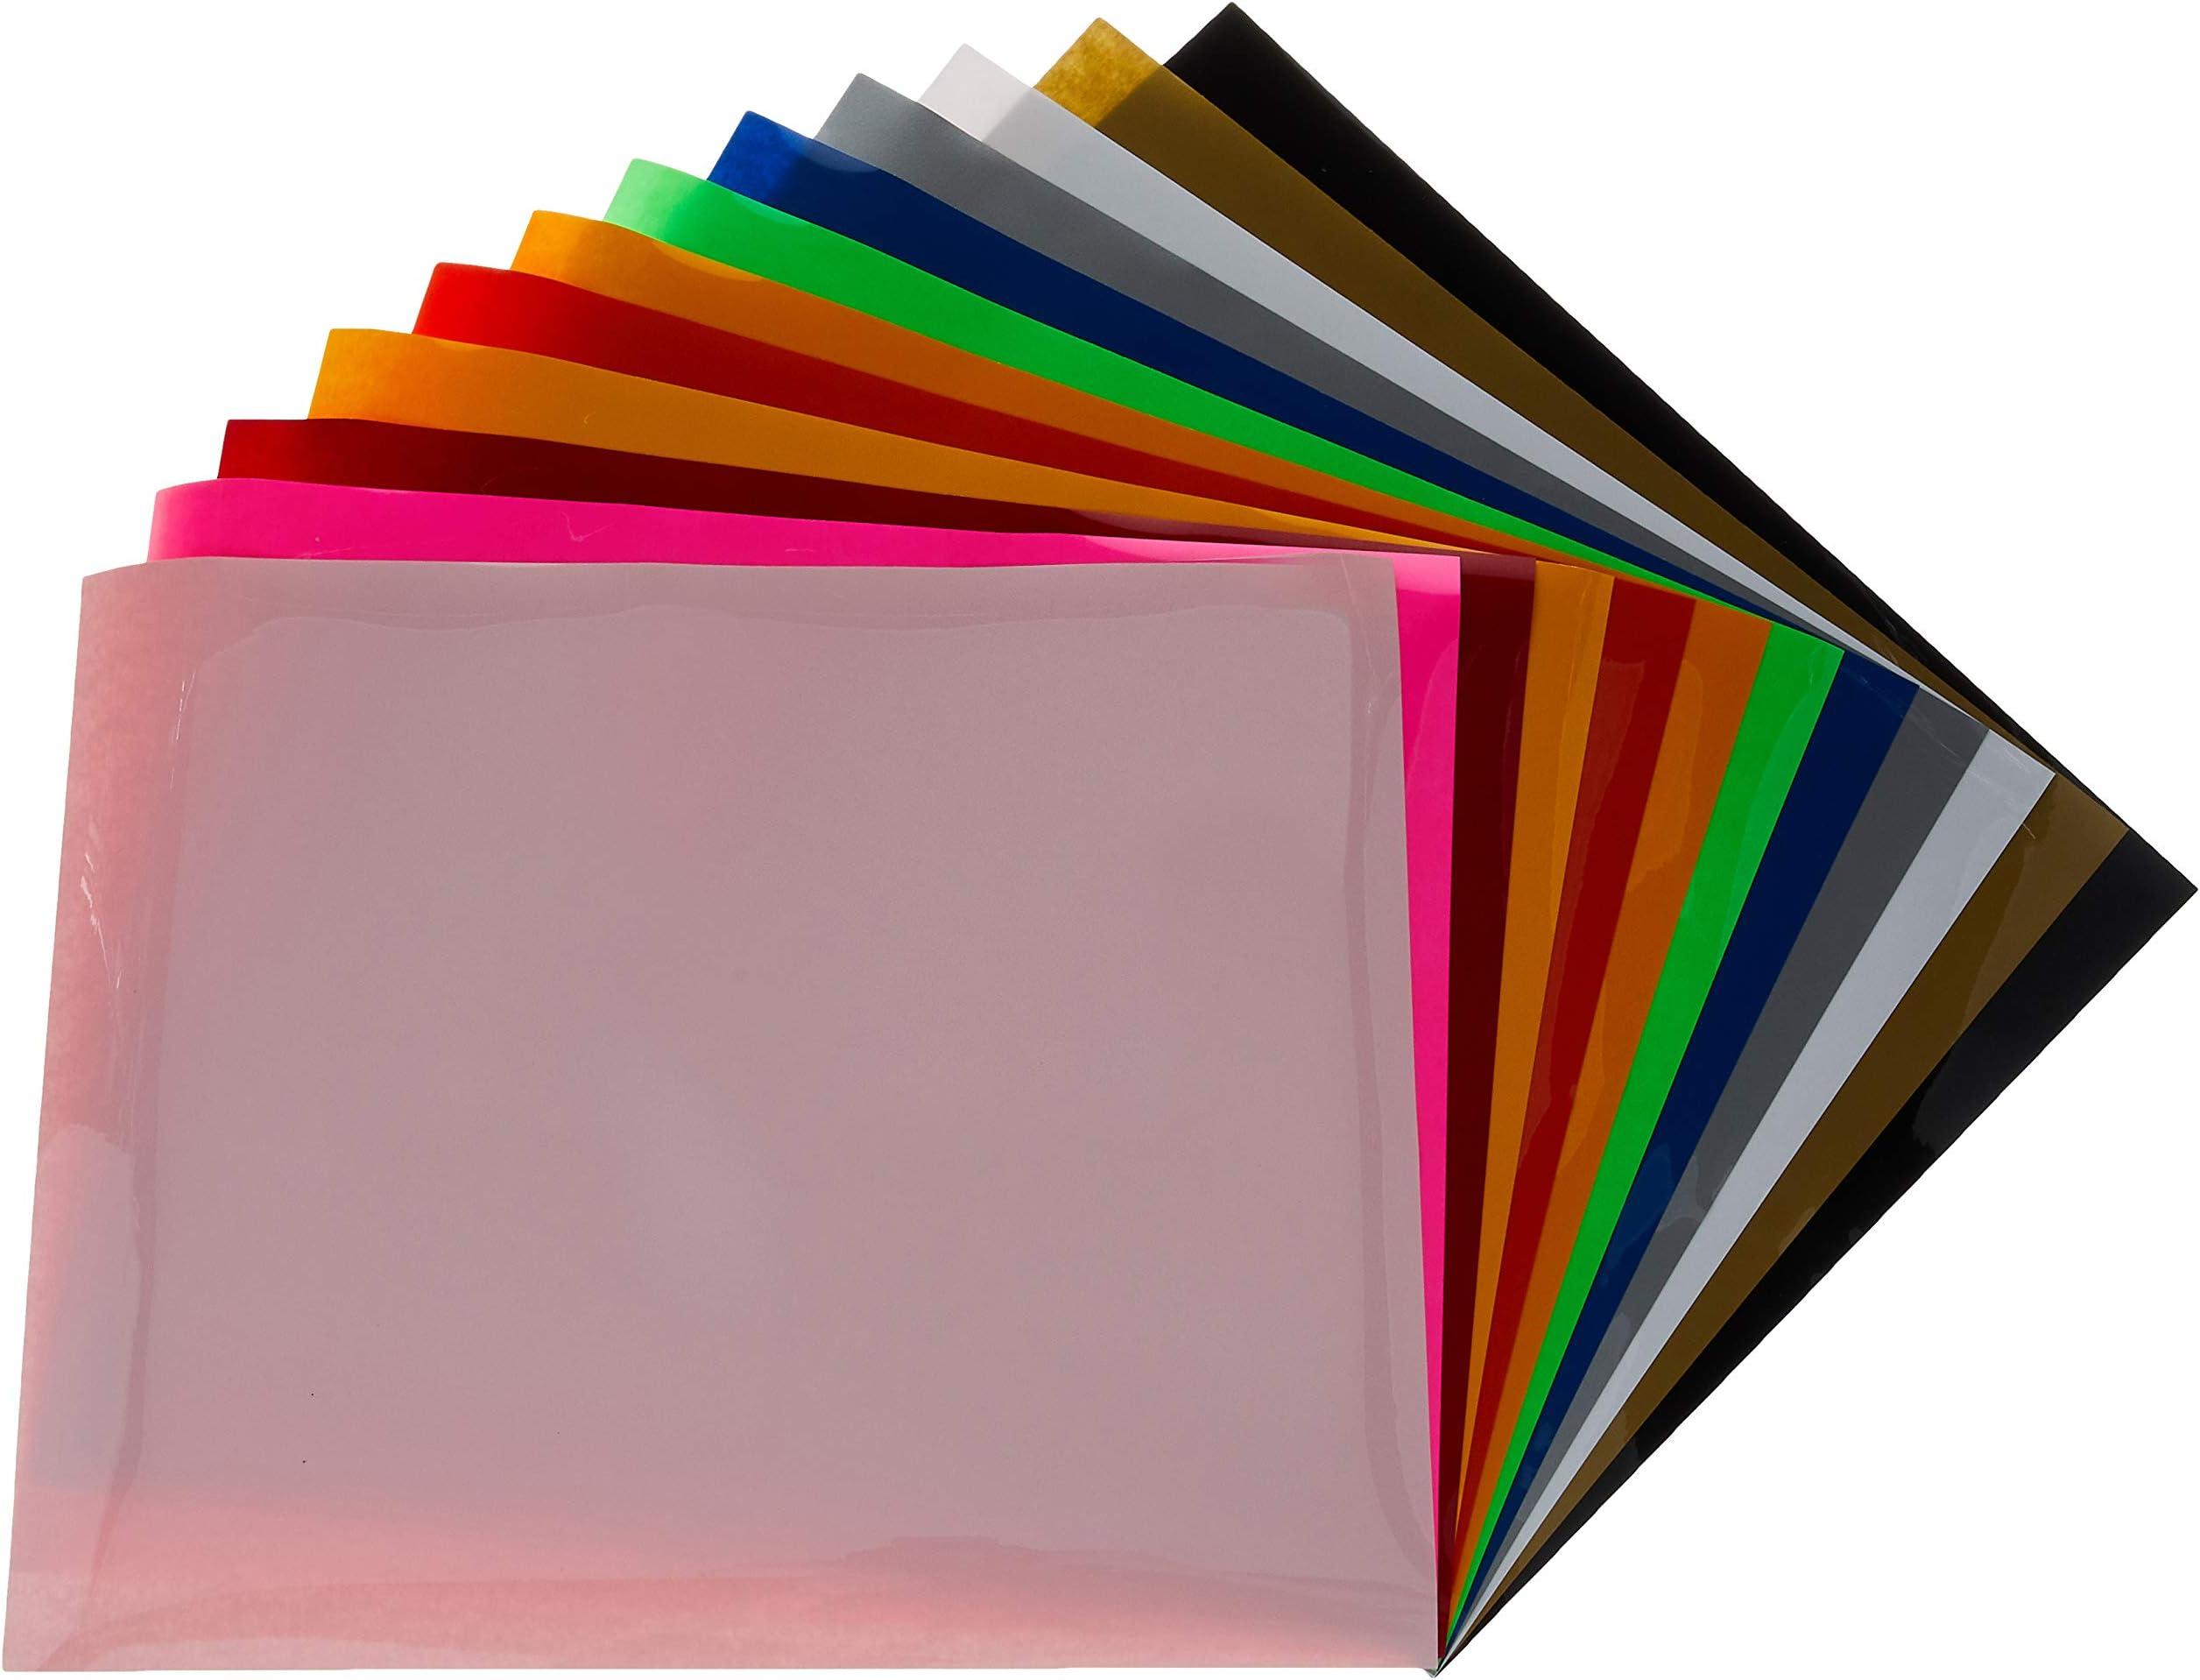 Heat Transfer Vinyl Rainbow Vinyl 15x12 Color Pack Siser Easyweed 6 Sheets HTV Iron On Vinyl Rainbow Color Pack